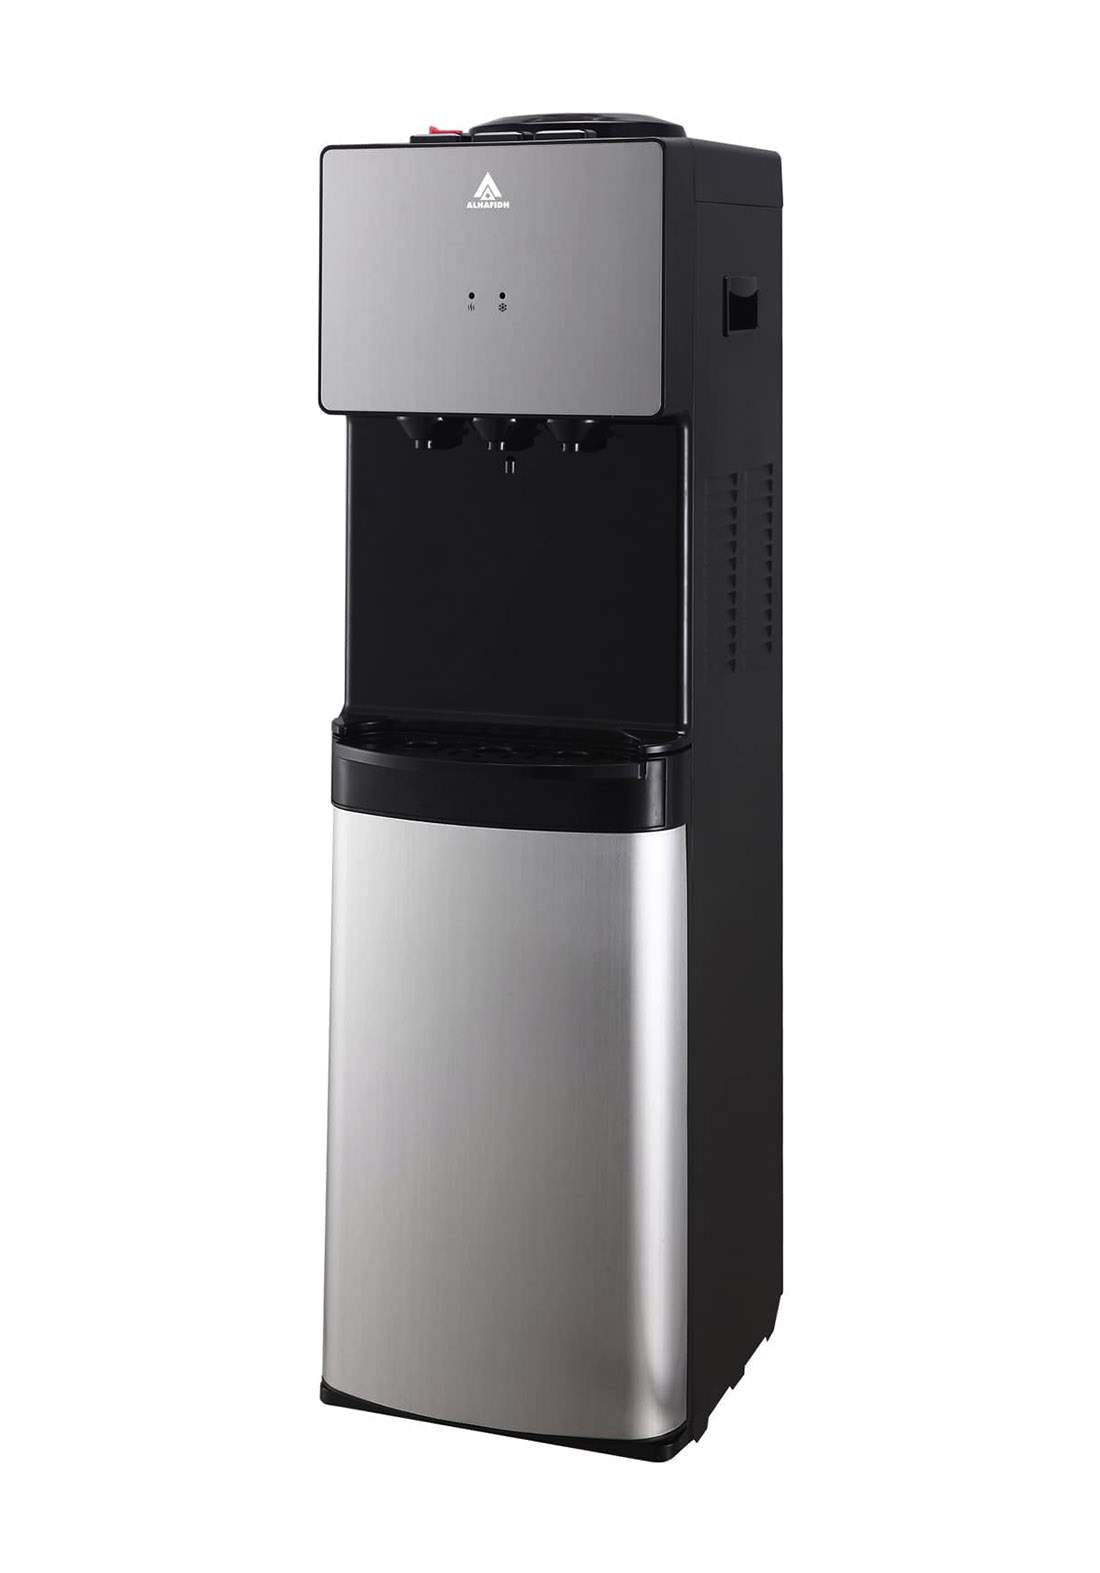 Alhafidh (DHA-58SSB) 3 Tap Free Standing Water Dispenser براد ماء عمودي